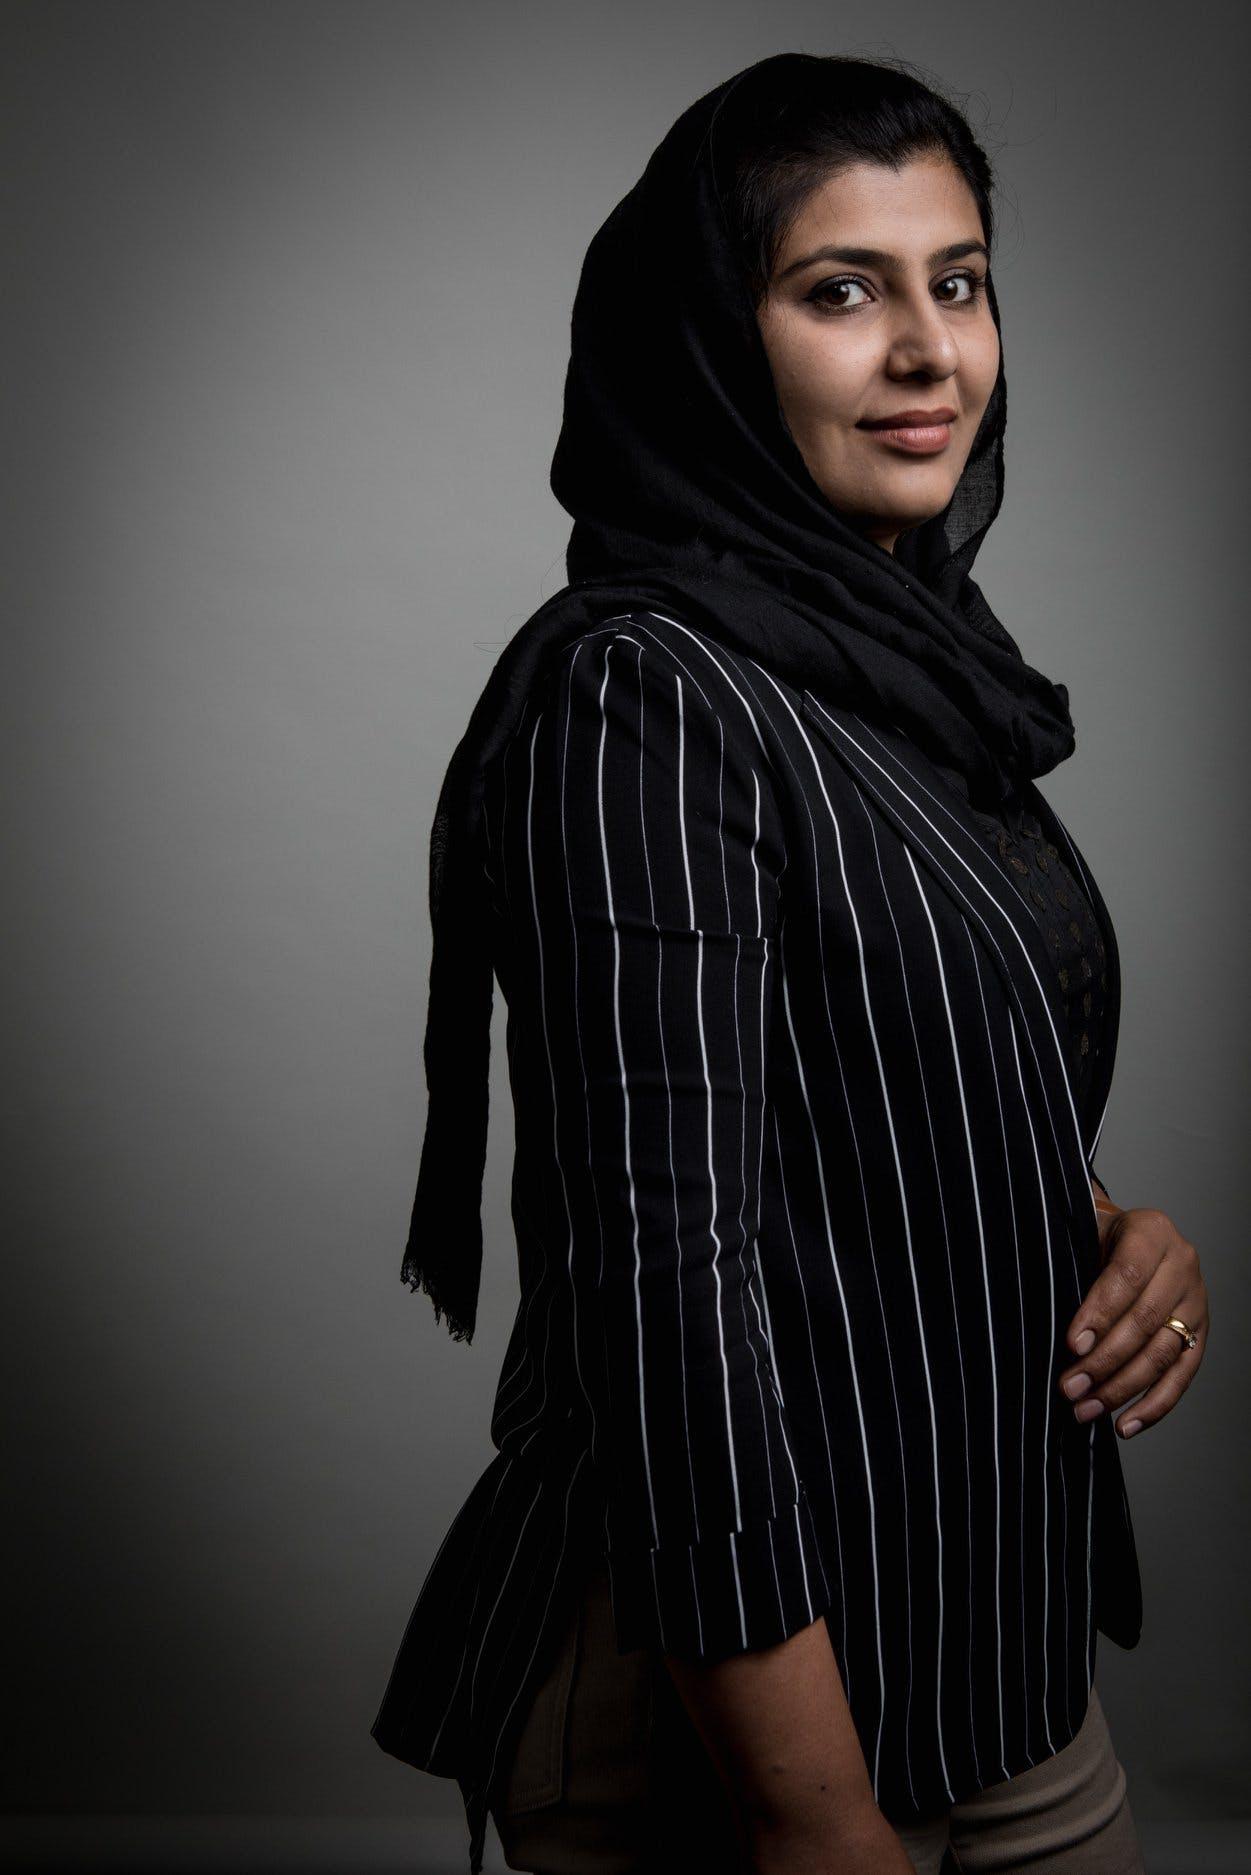 Rabia Ahmadi